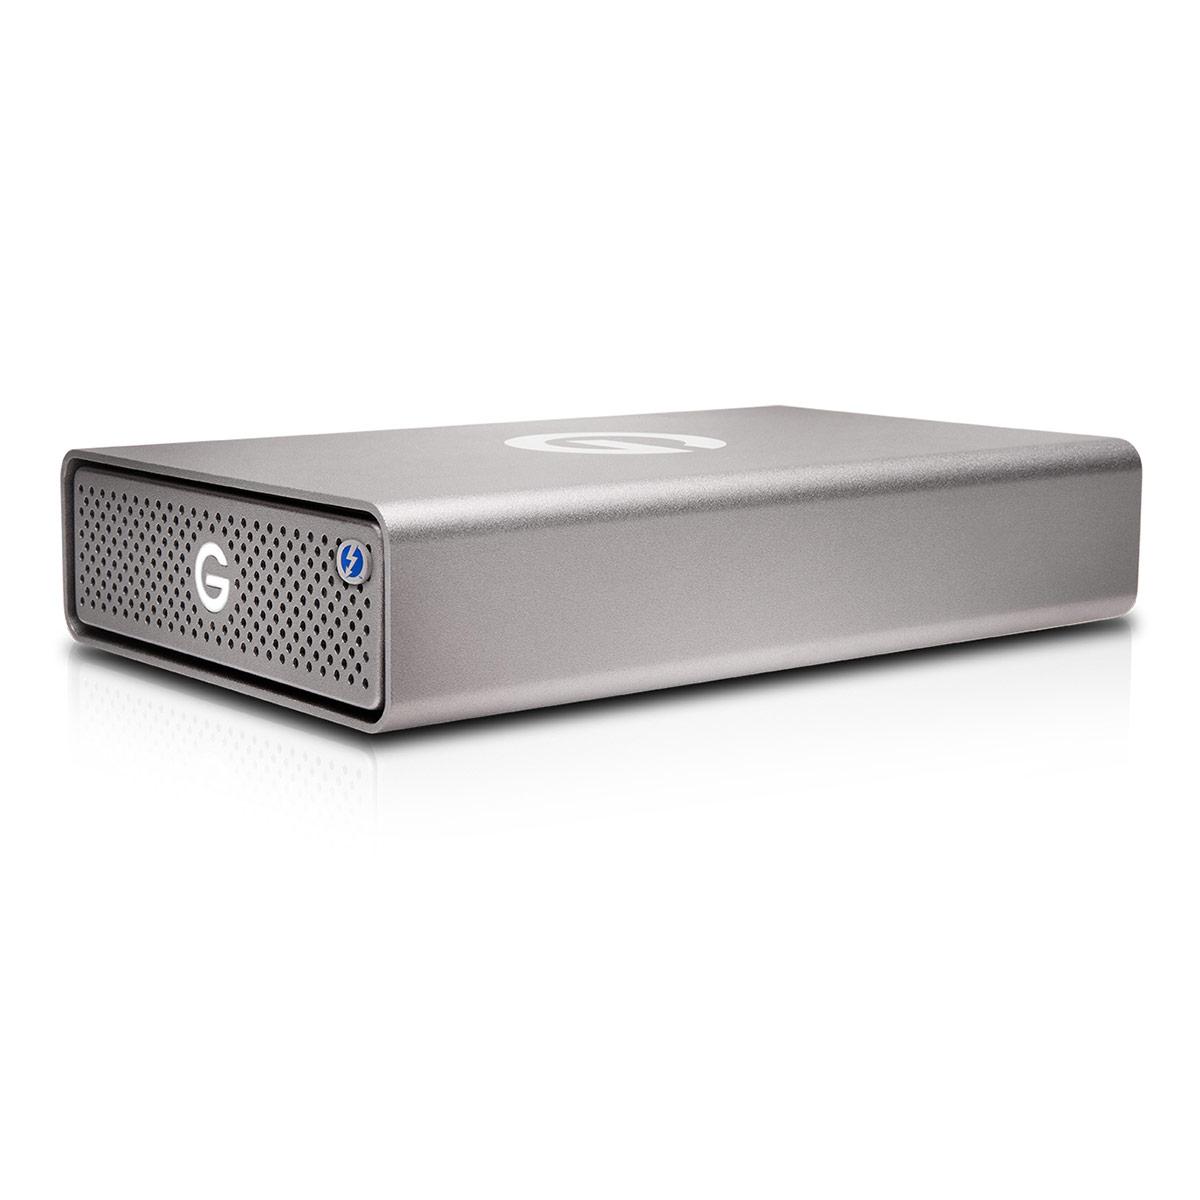 G-Technology G-DRIVE Pro SSD 960GB Thunderbolt3 Desktop SSD Drive